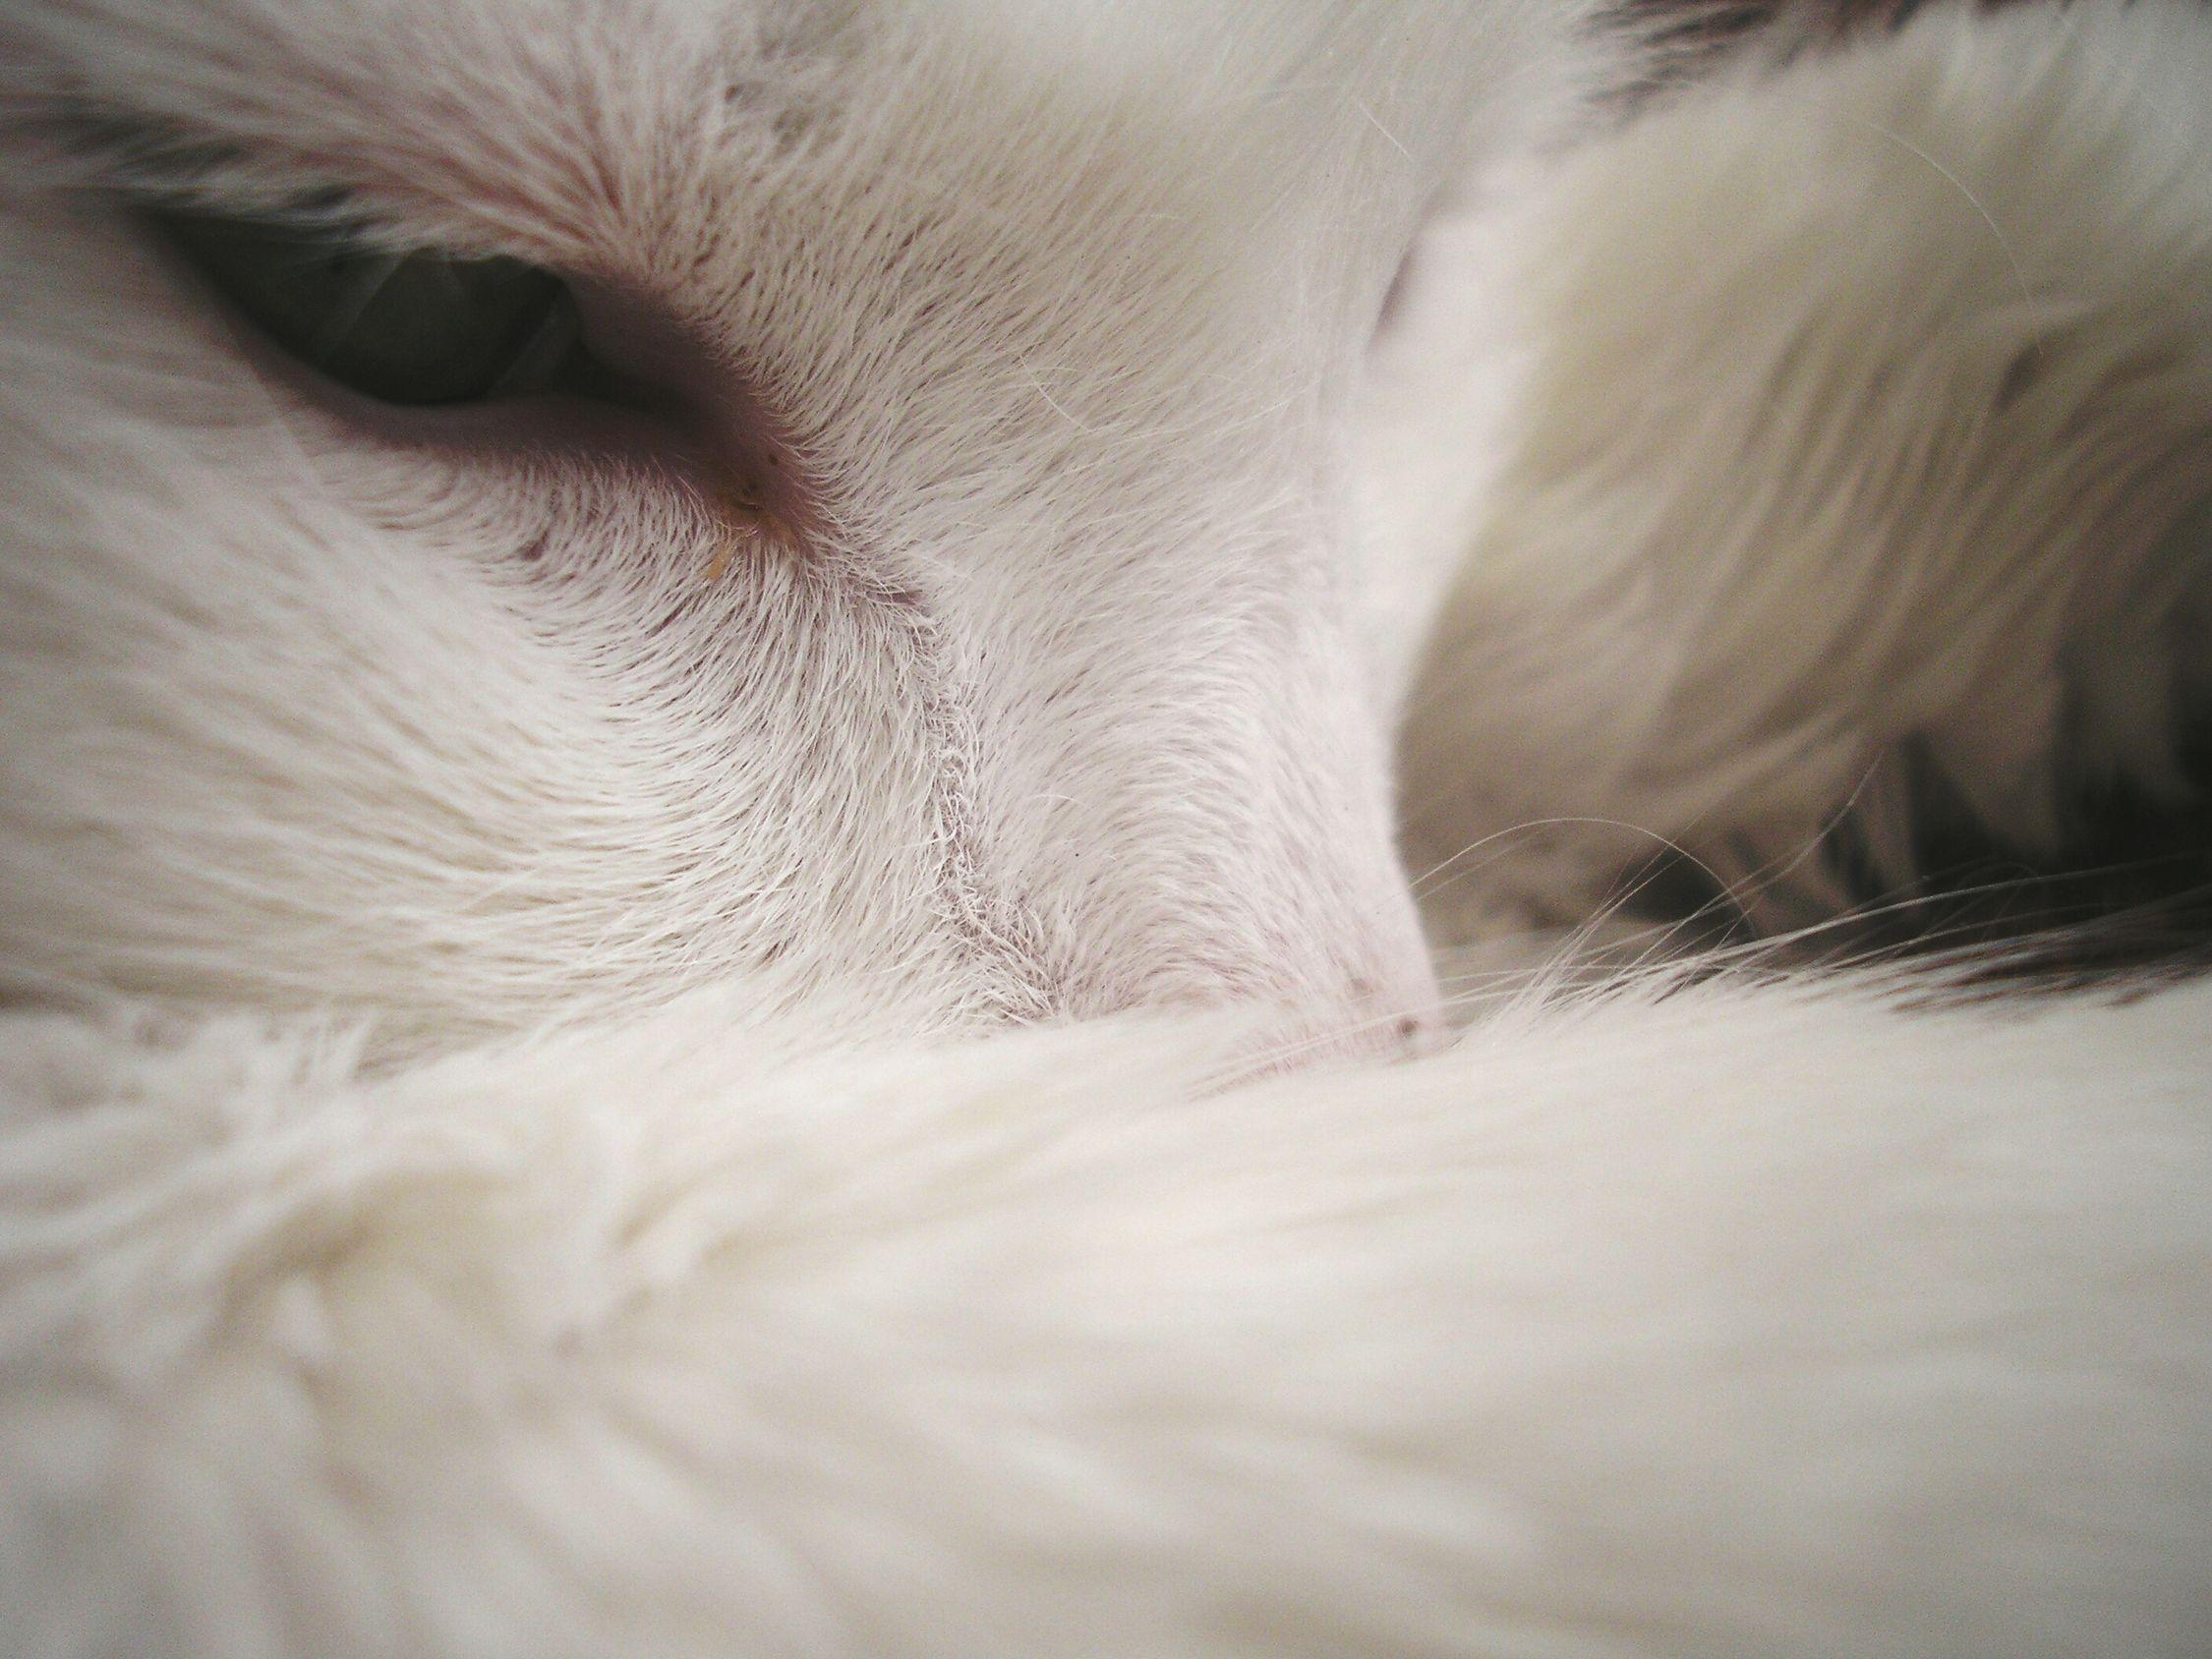 Cat Pet Home Macro WhiteAnimal SweetKitty SoftWool Afternoon Photo HomePet Home Sweet Home пушок  Котик мяу белый шаурма пушистый лентяй спиткот Зеленые глаза любимыйкот питомец старичок